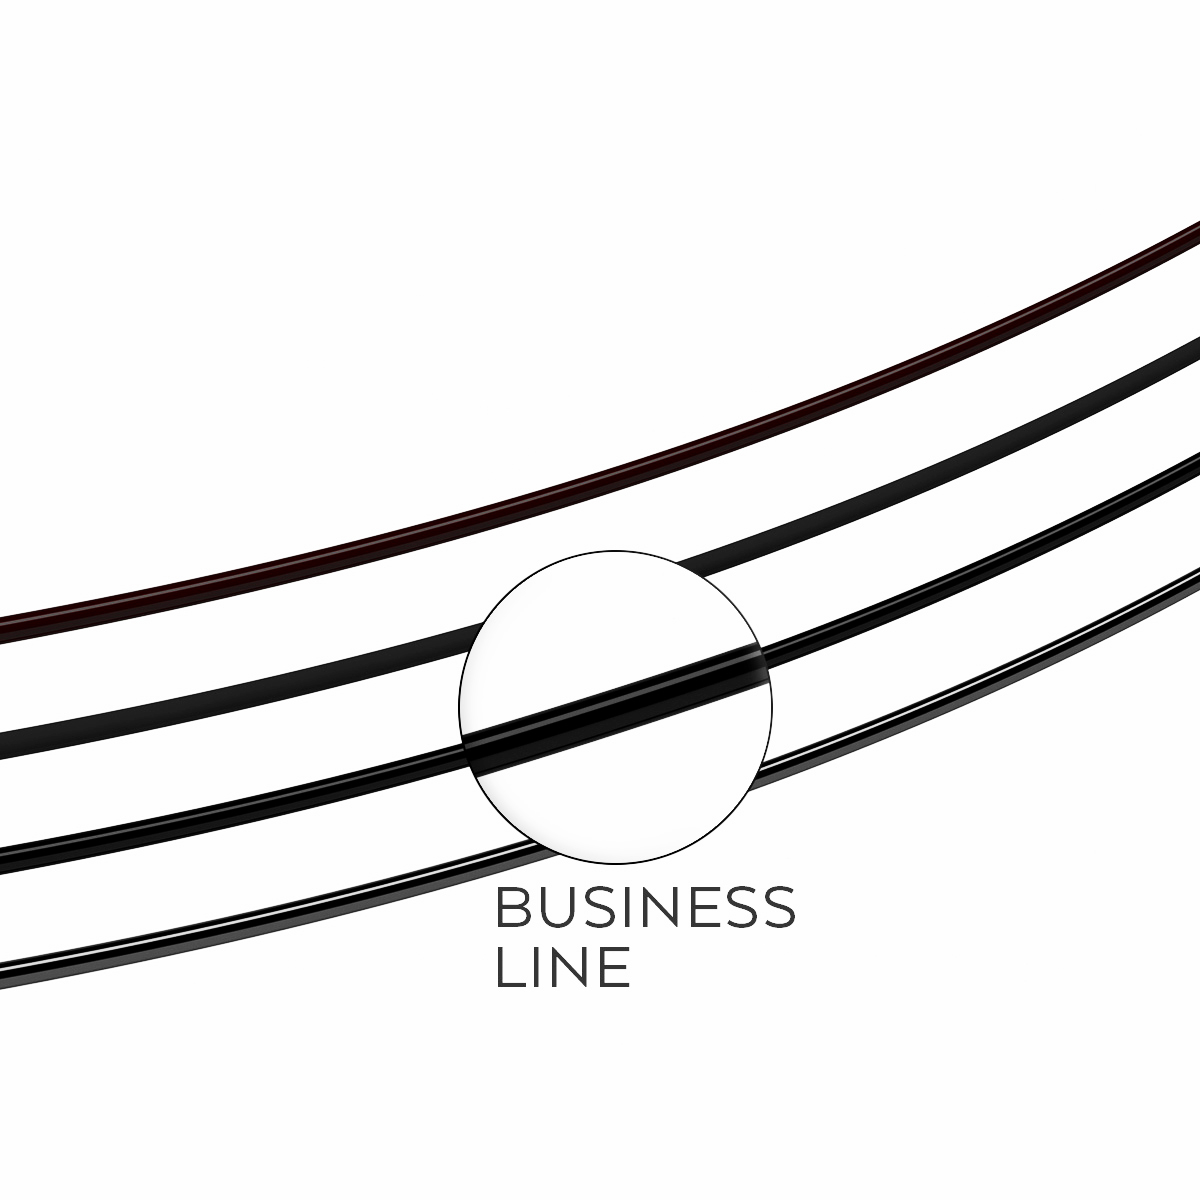 business-line-black-c-0-07